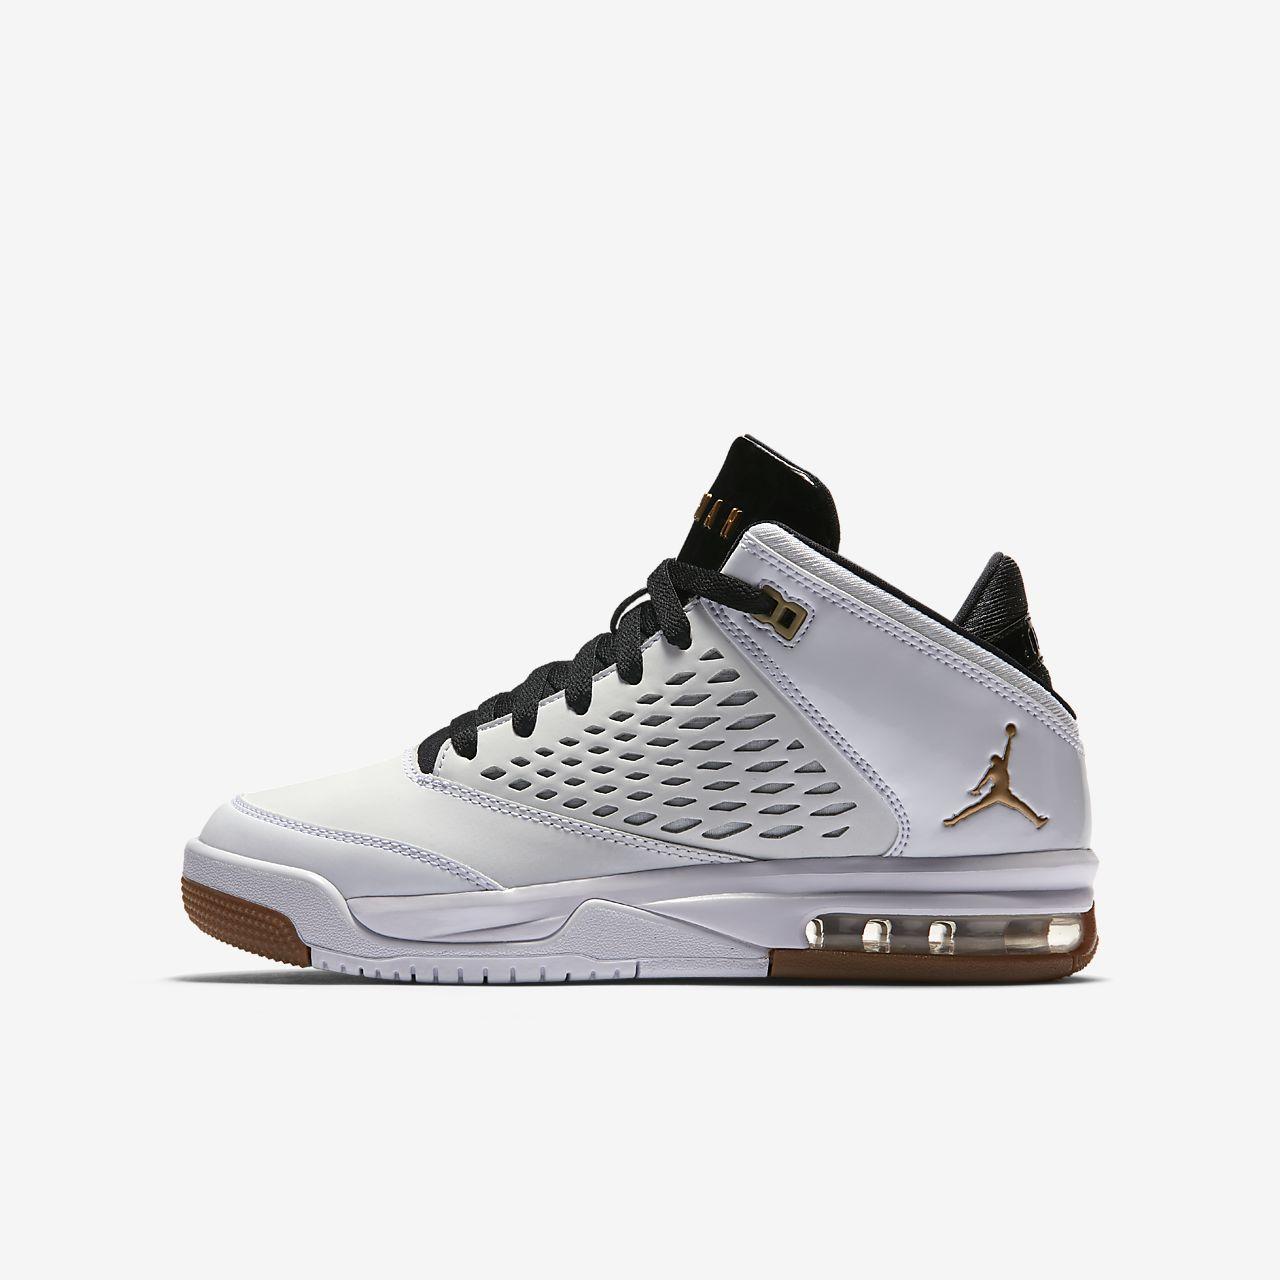 jordan hightop shoes for boys nz